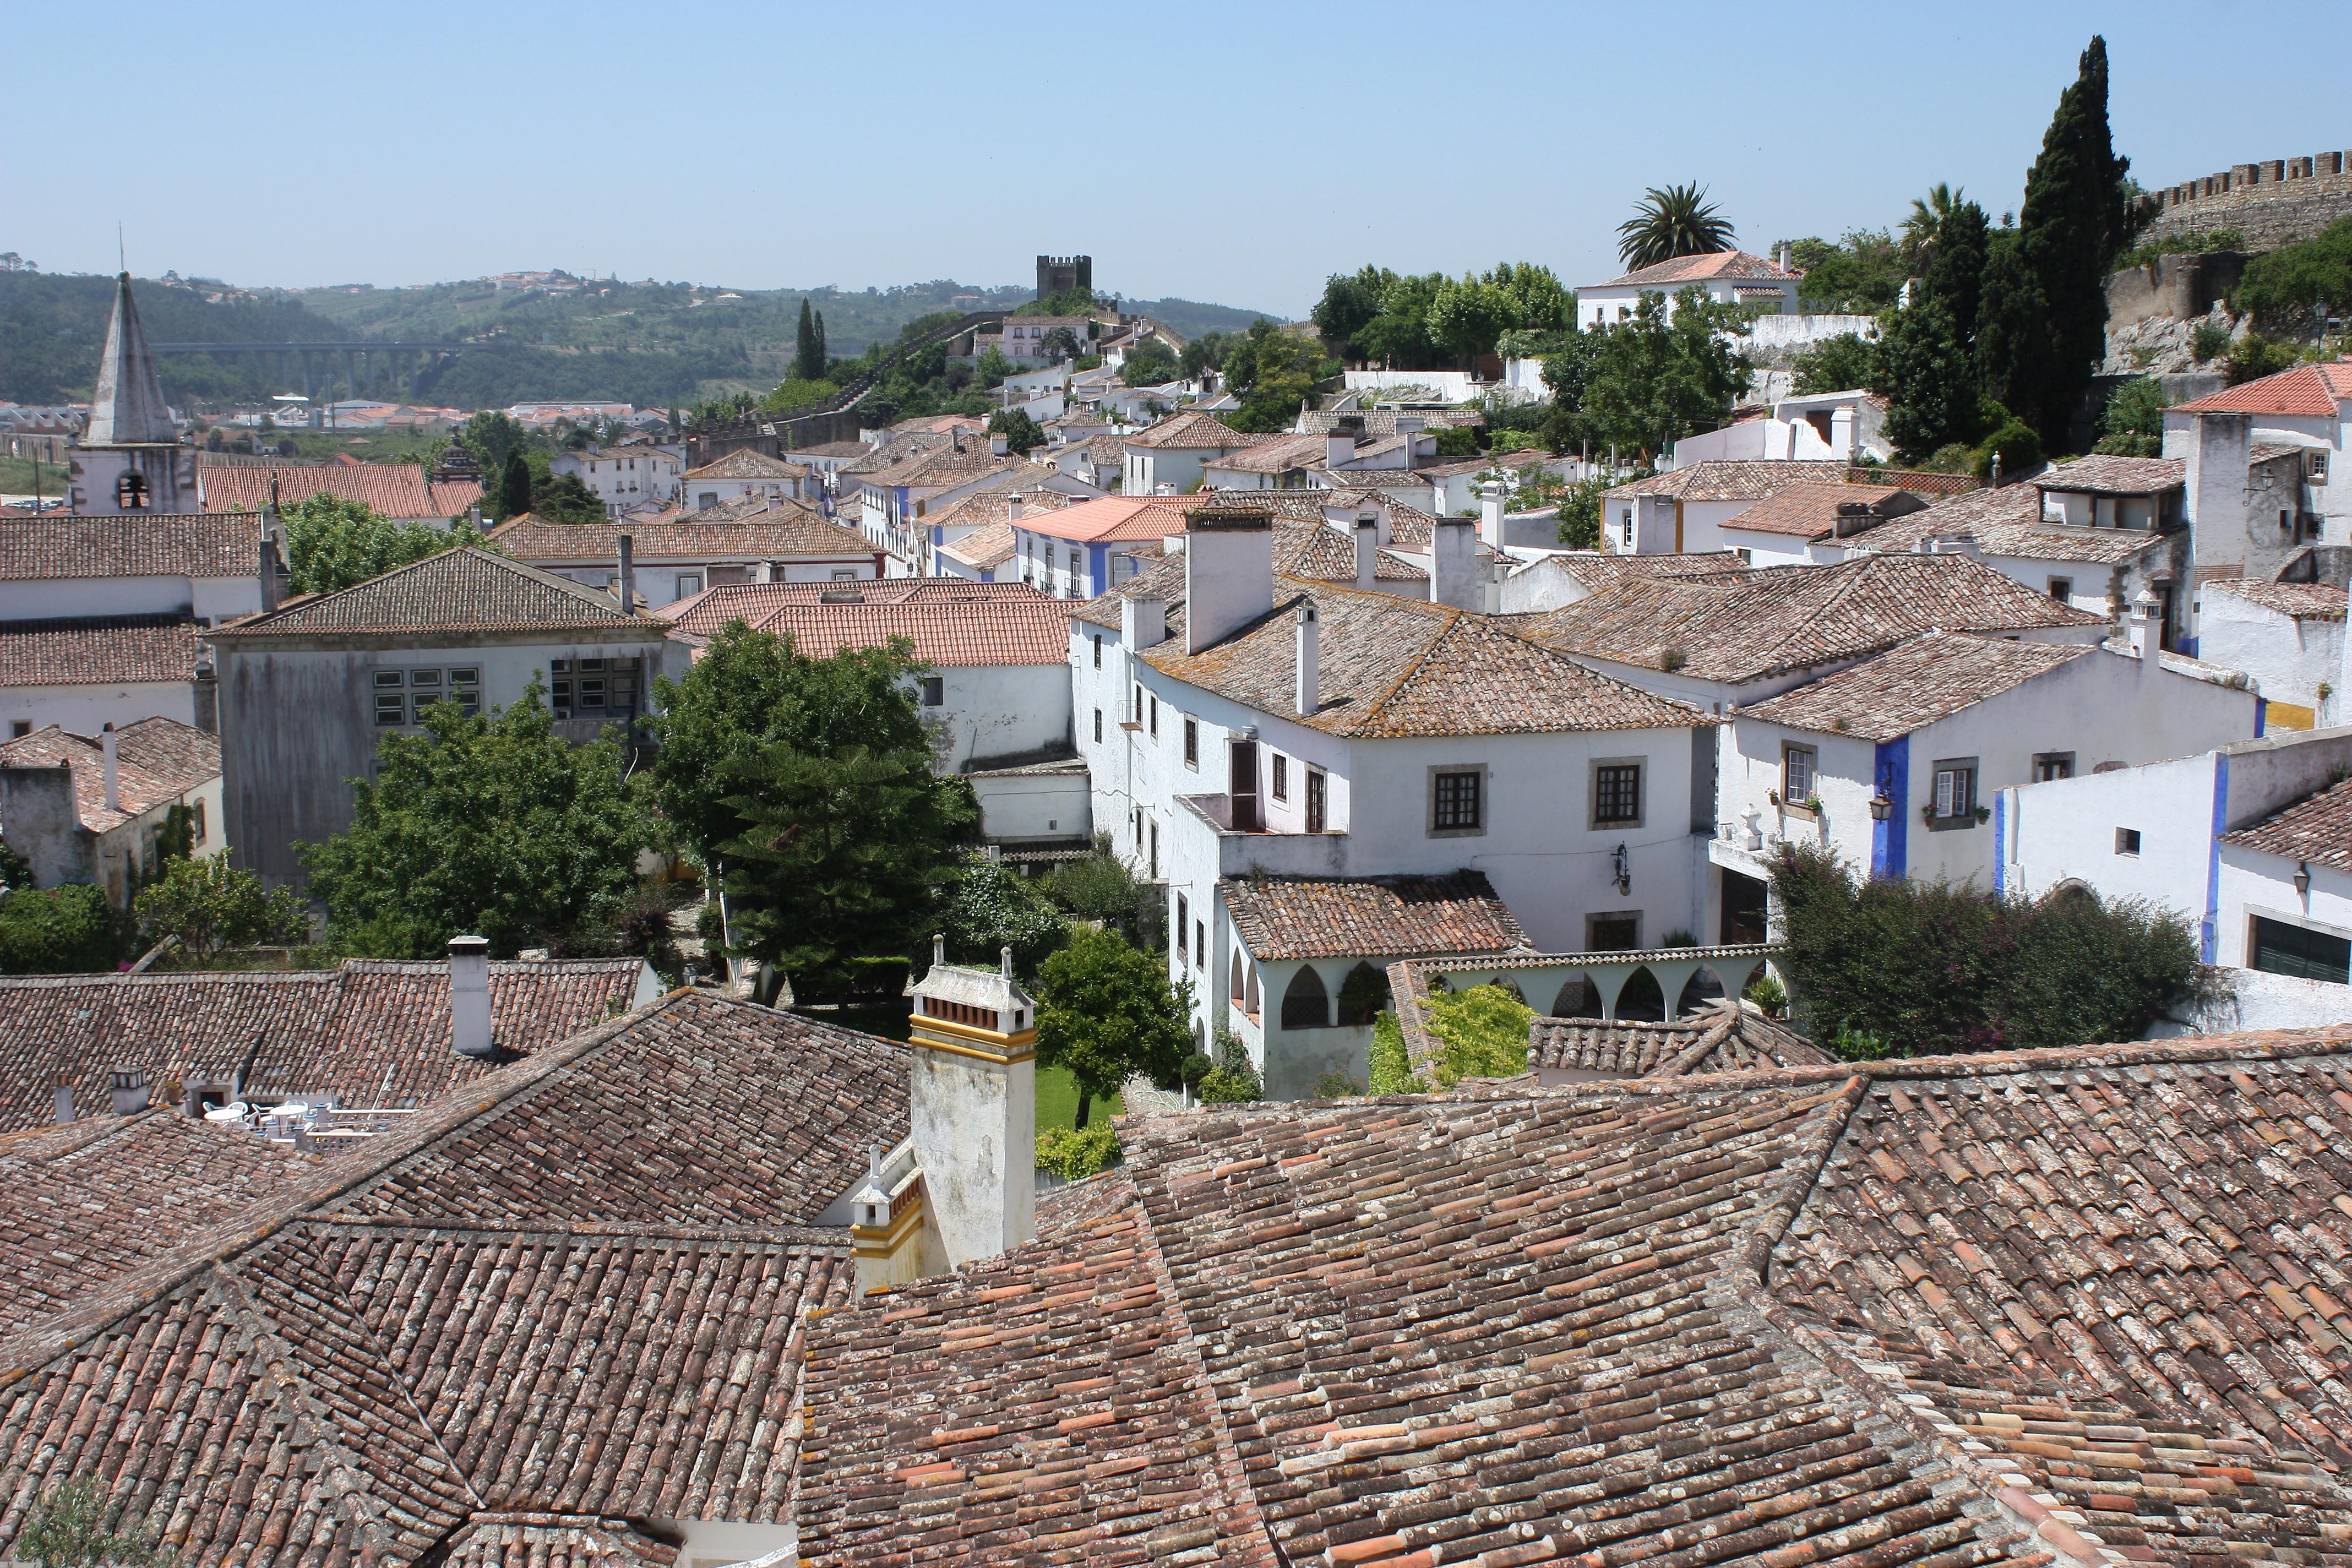 Doulike dating i portugal